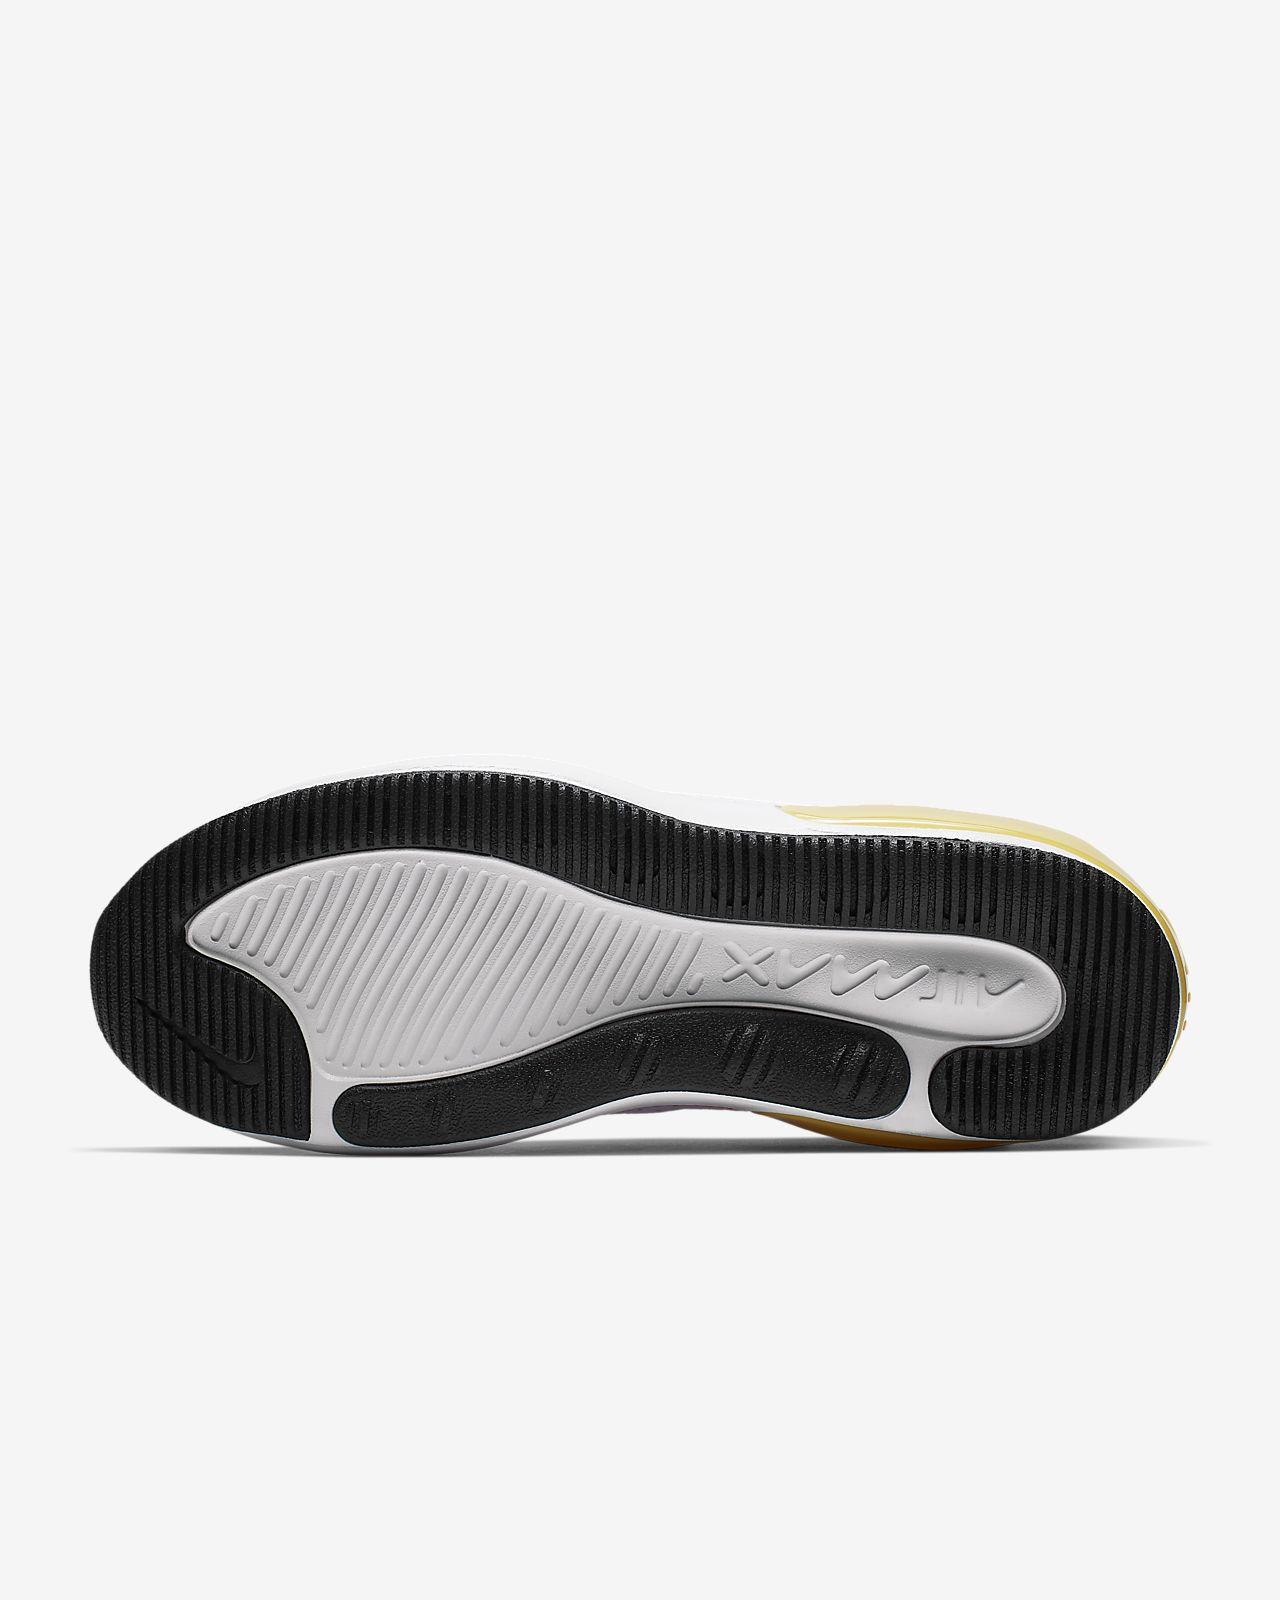 hot sale online 3ad29 6c25c ... Calzado Nike Air Max Dia SE